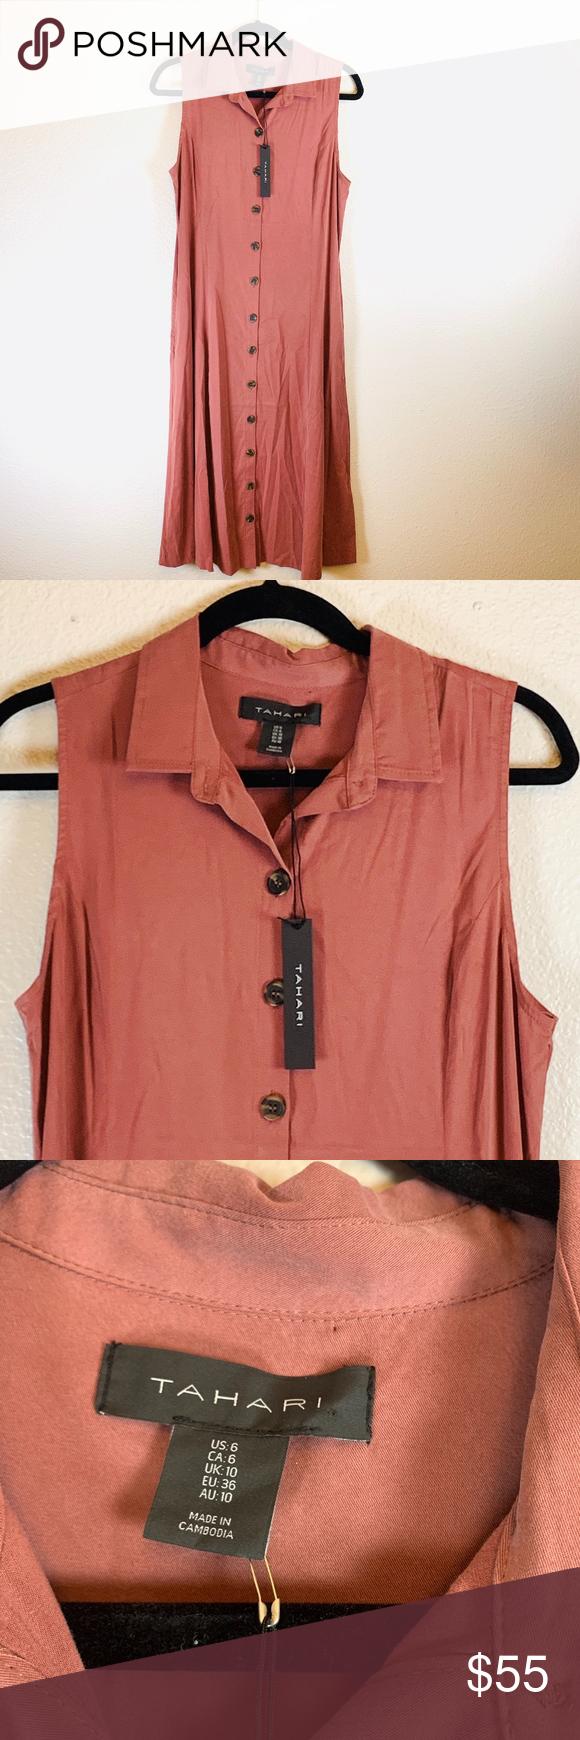 Tahari Button Down Maxi Dress Size 6 Clothes Design Maxi Dress Tahari Dress [ 1740 x 580 Pixel ]